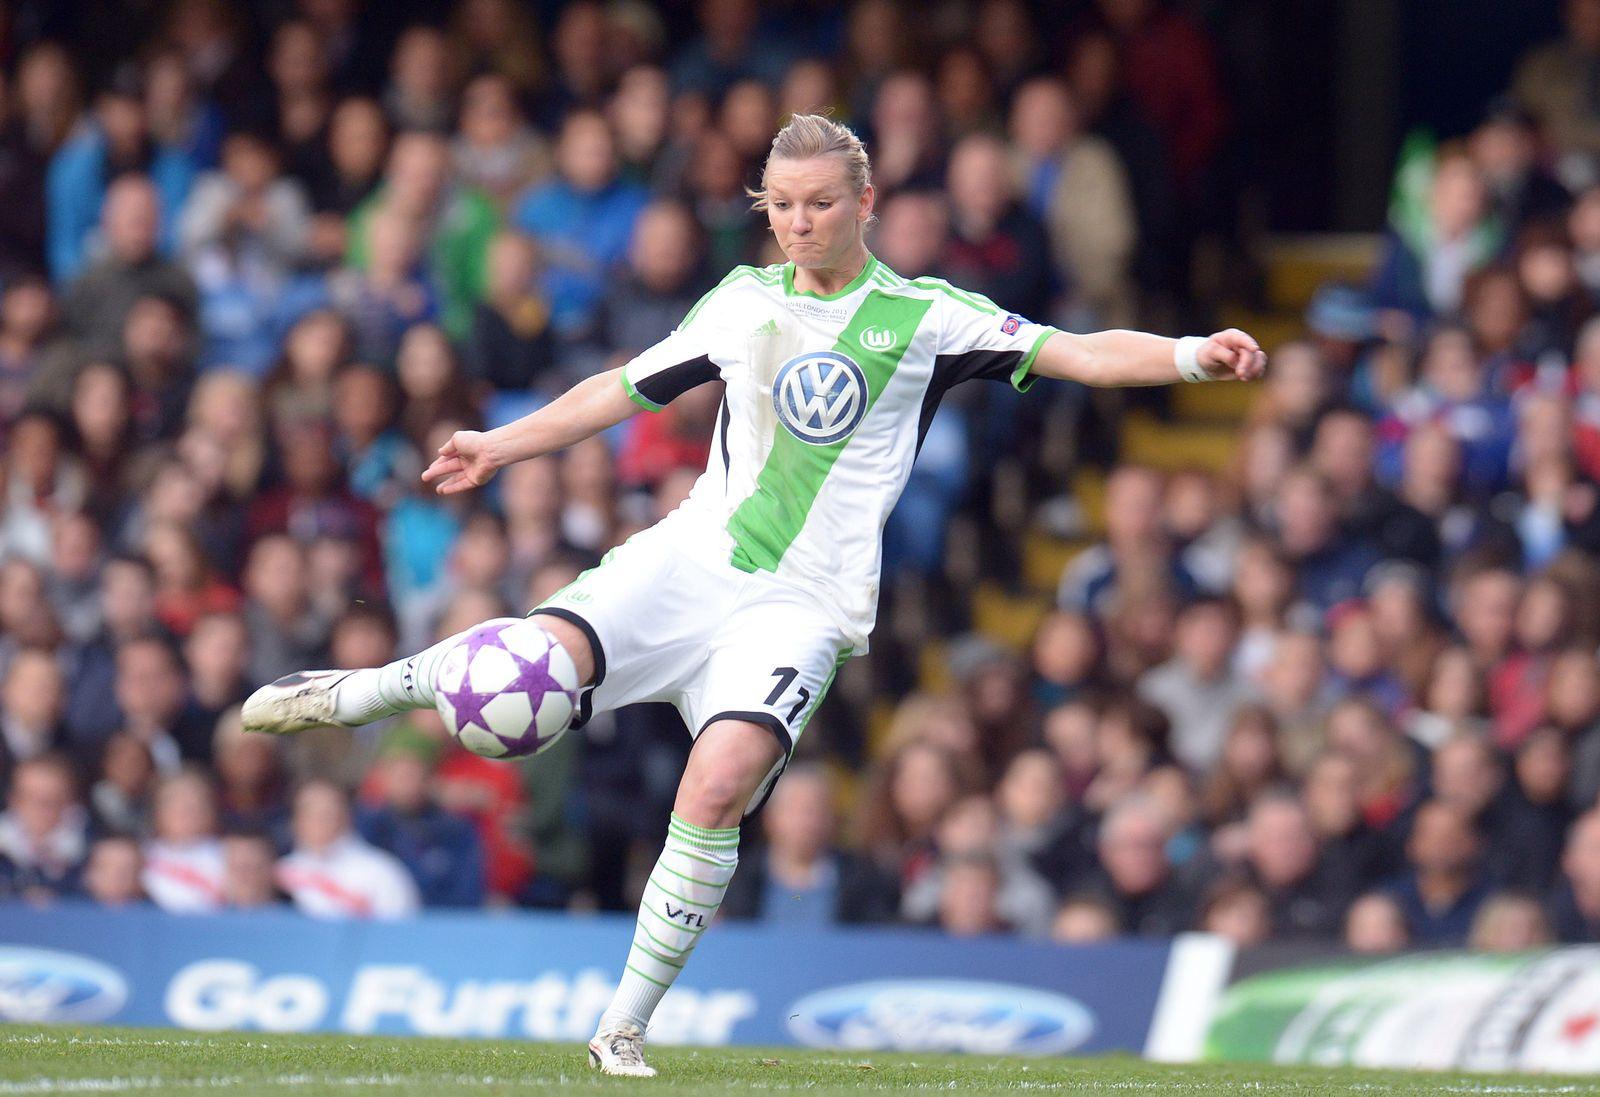 Champions League VfL Wolfsburg - Olympique Lyon